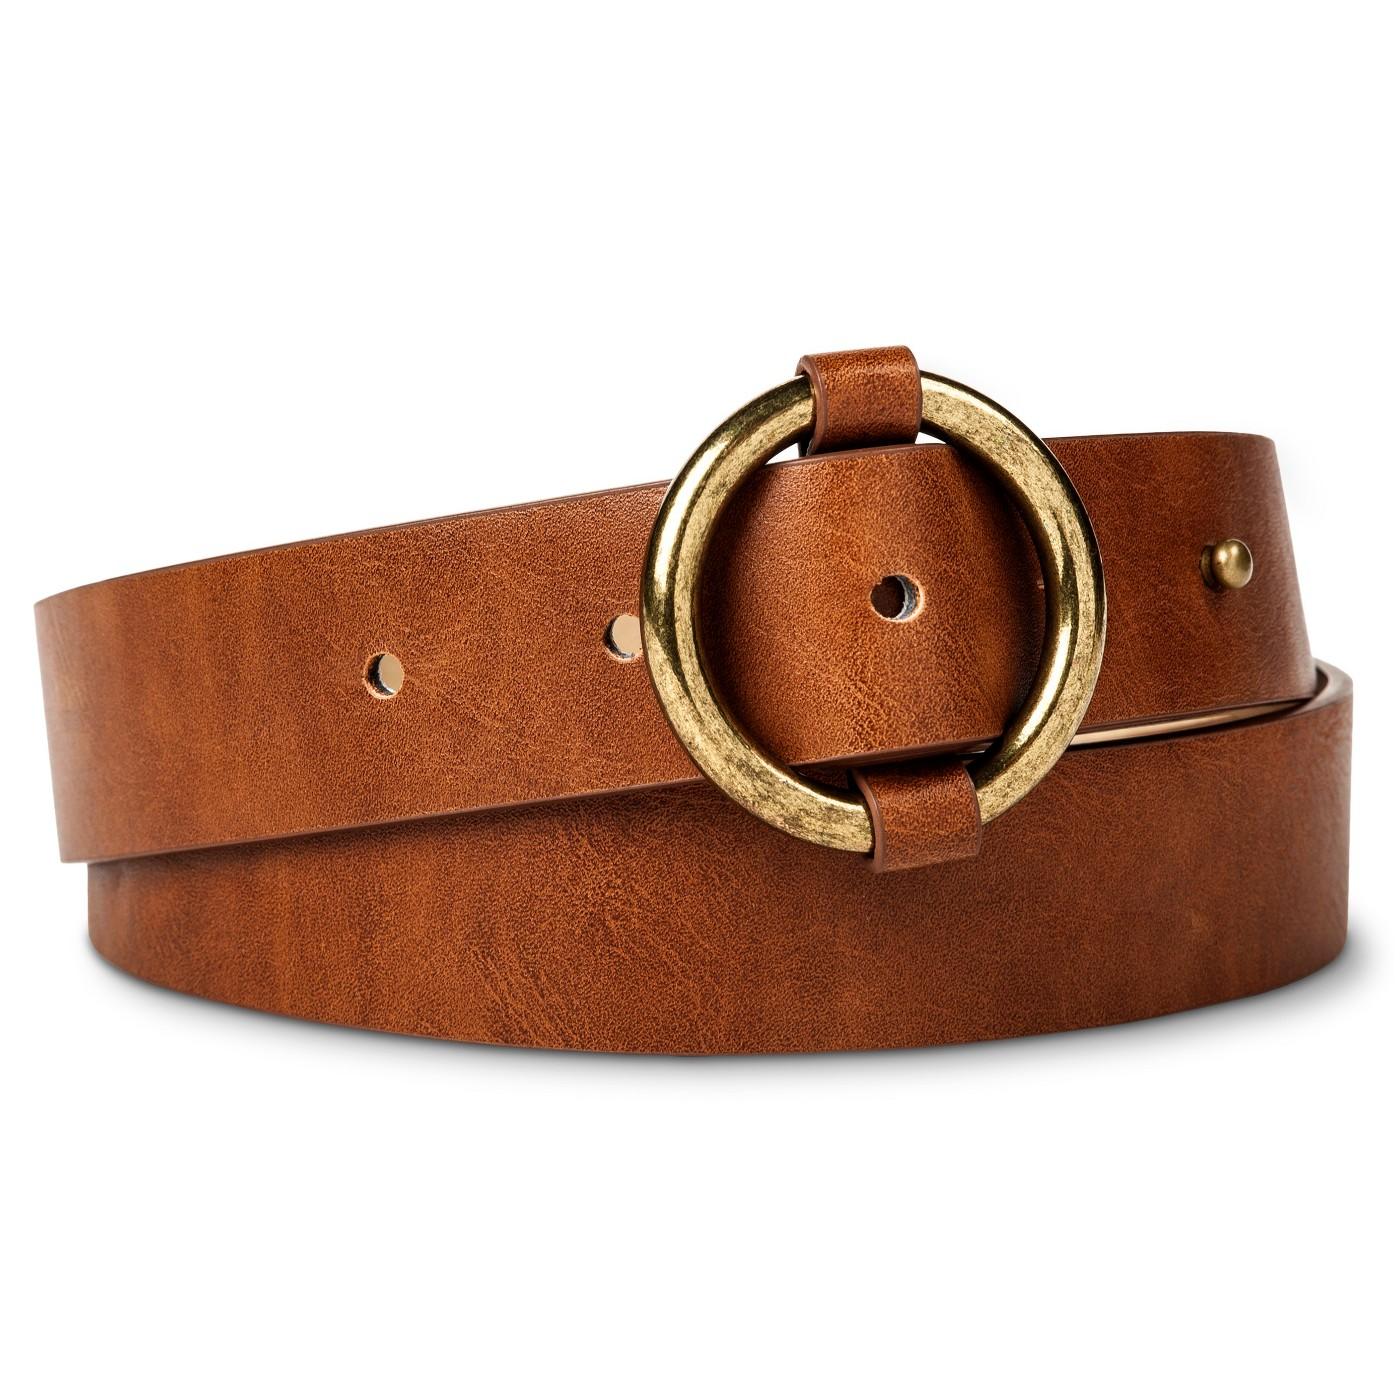 spotted maxi - target belt.jpg